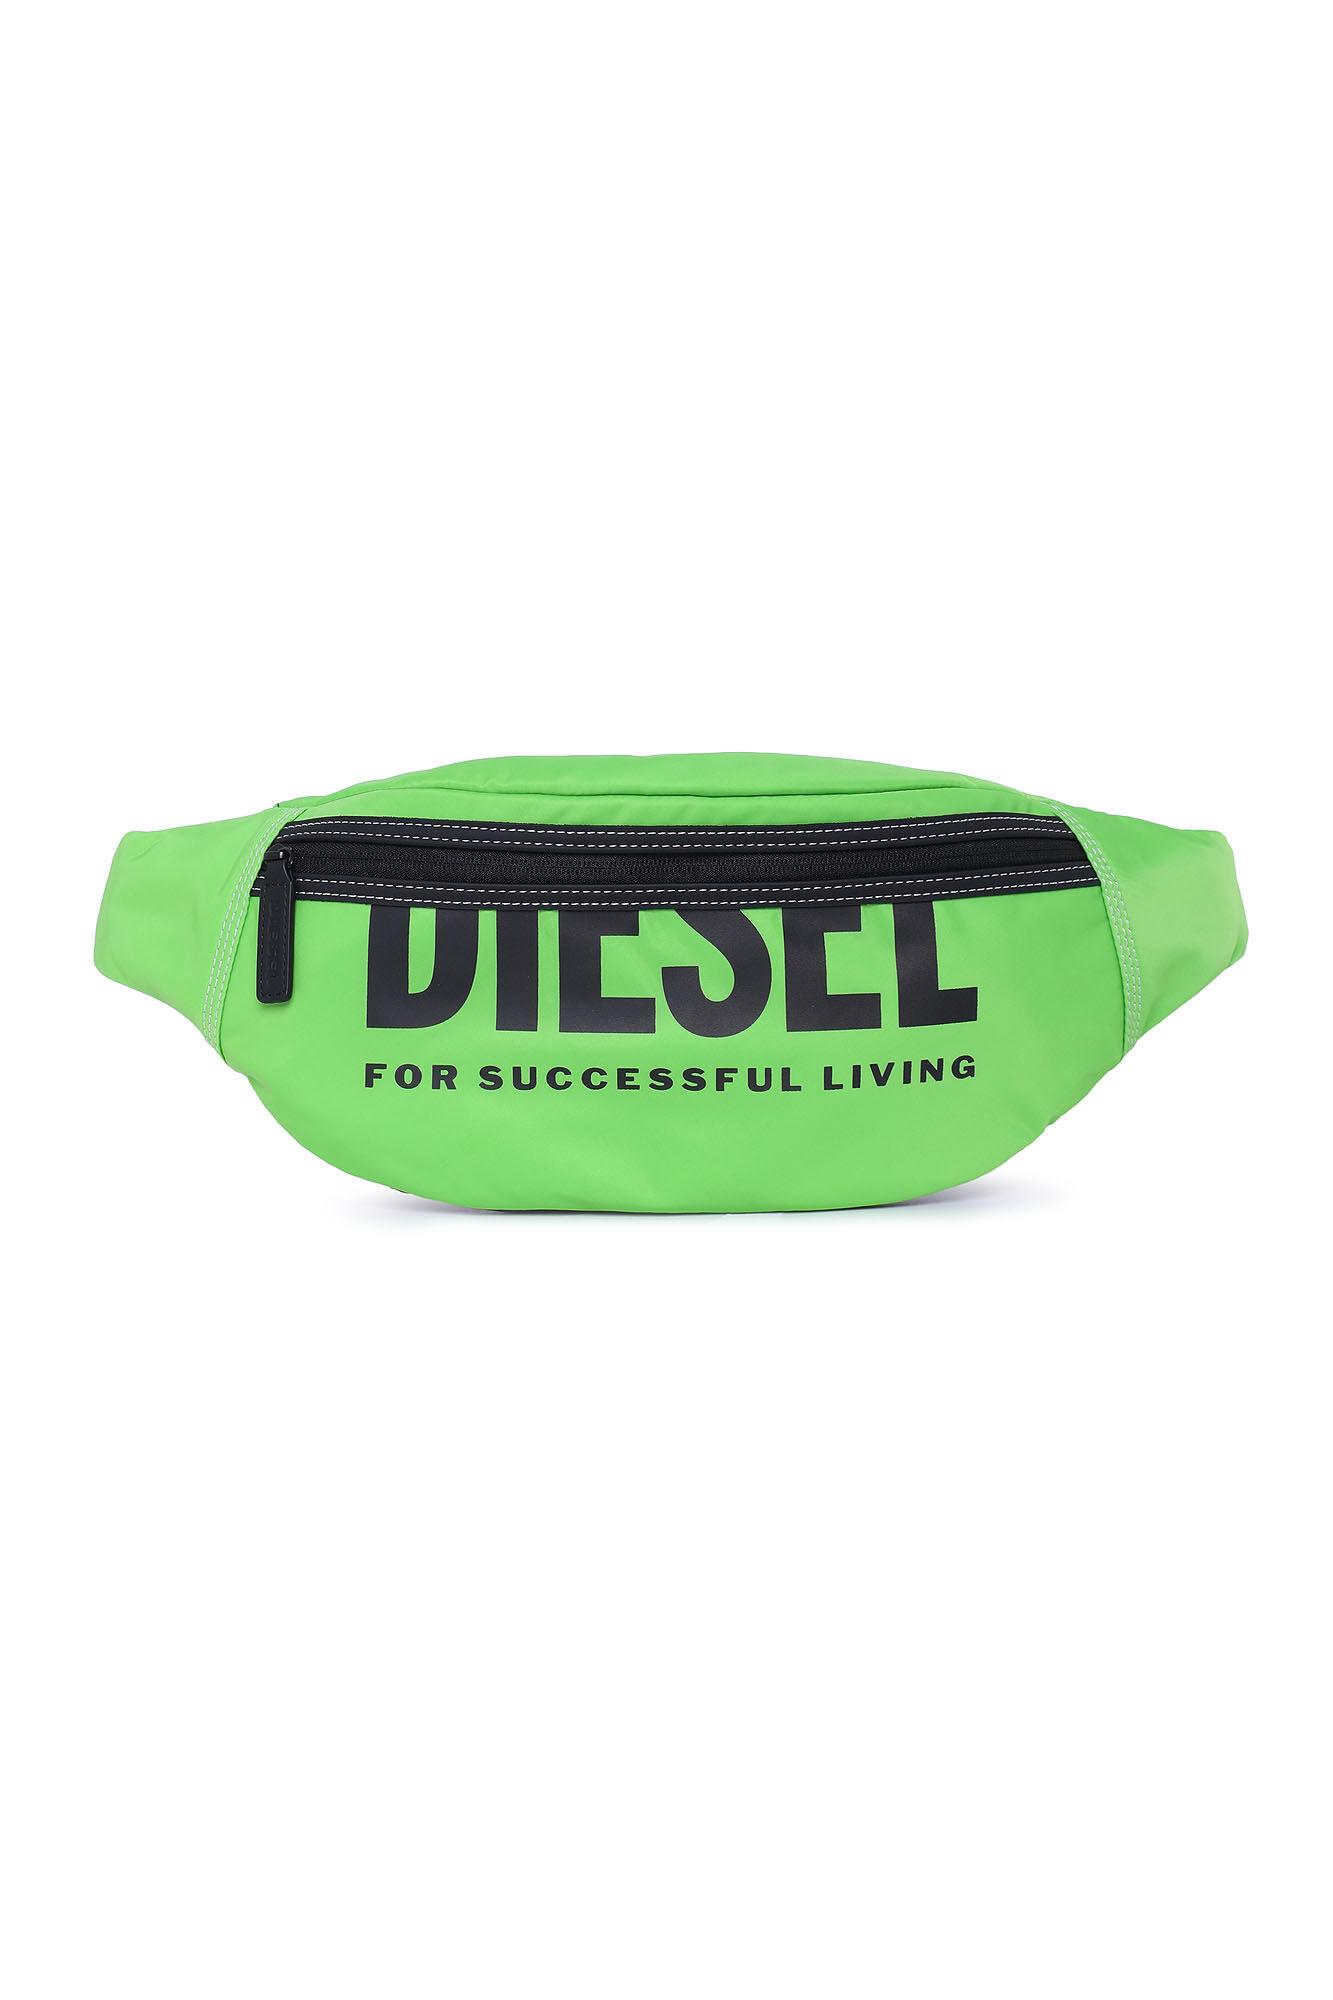 Boldmessage Bold Maxibelt Ii Borsa - Diesel Kid